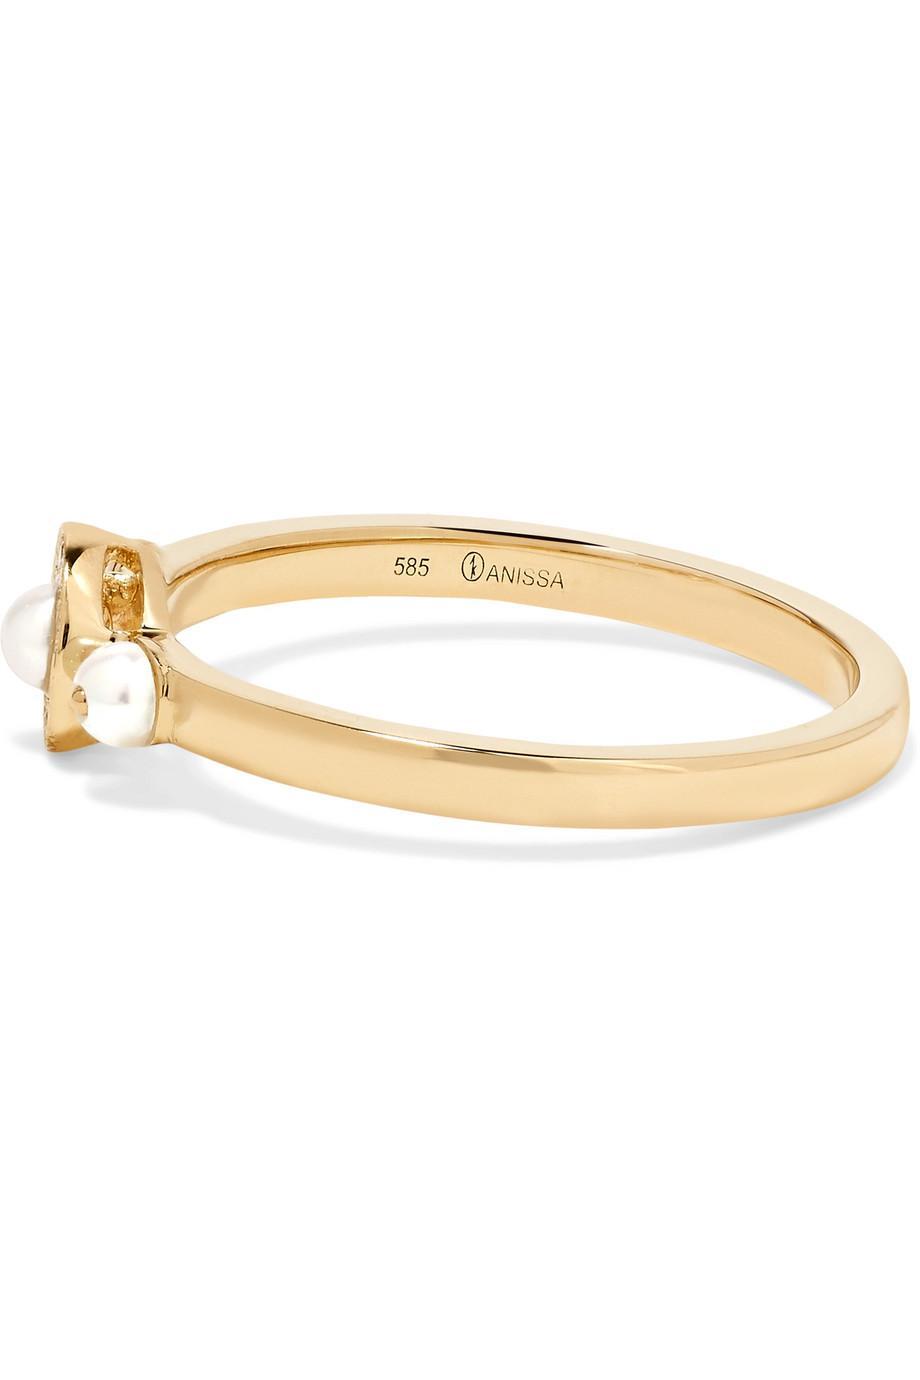 Anissa Kermiche Mignonne 14-karat Gold, Pearl And Diamond Ring